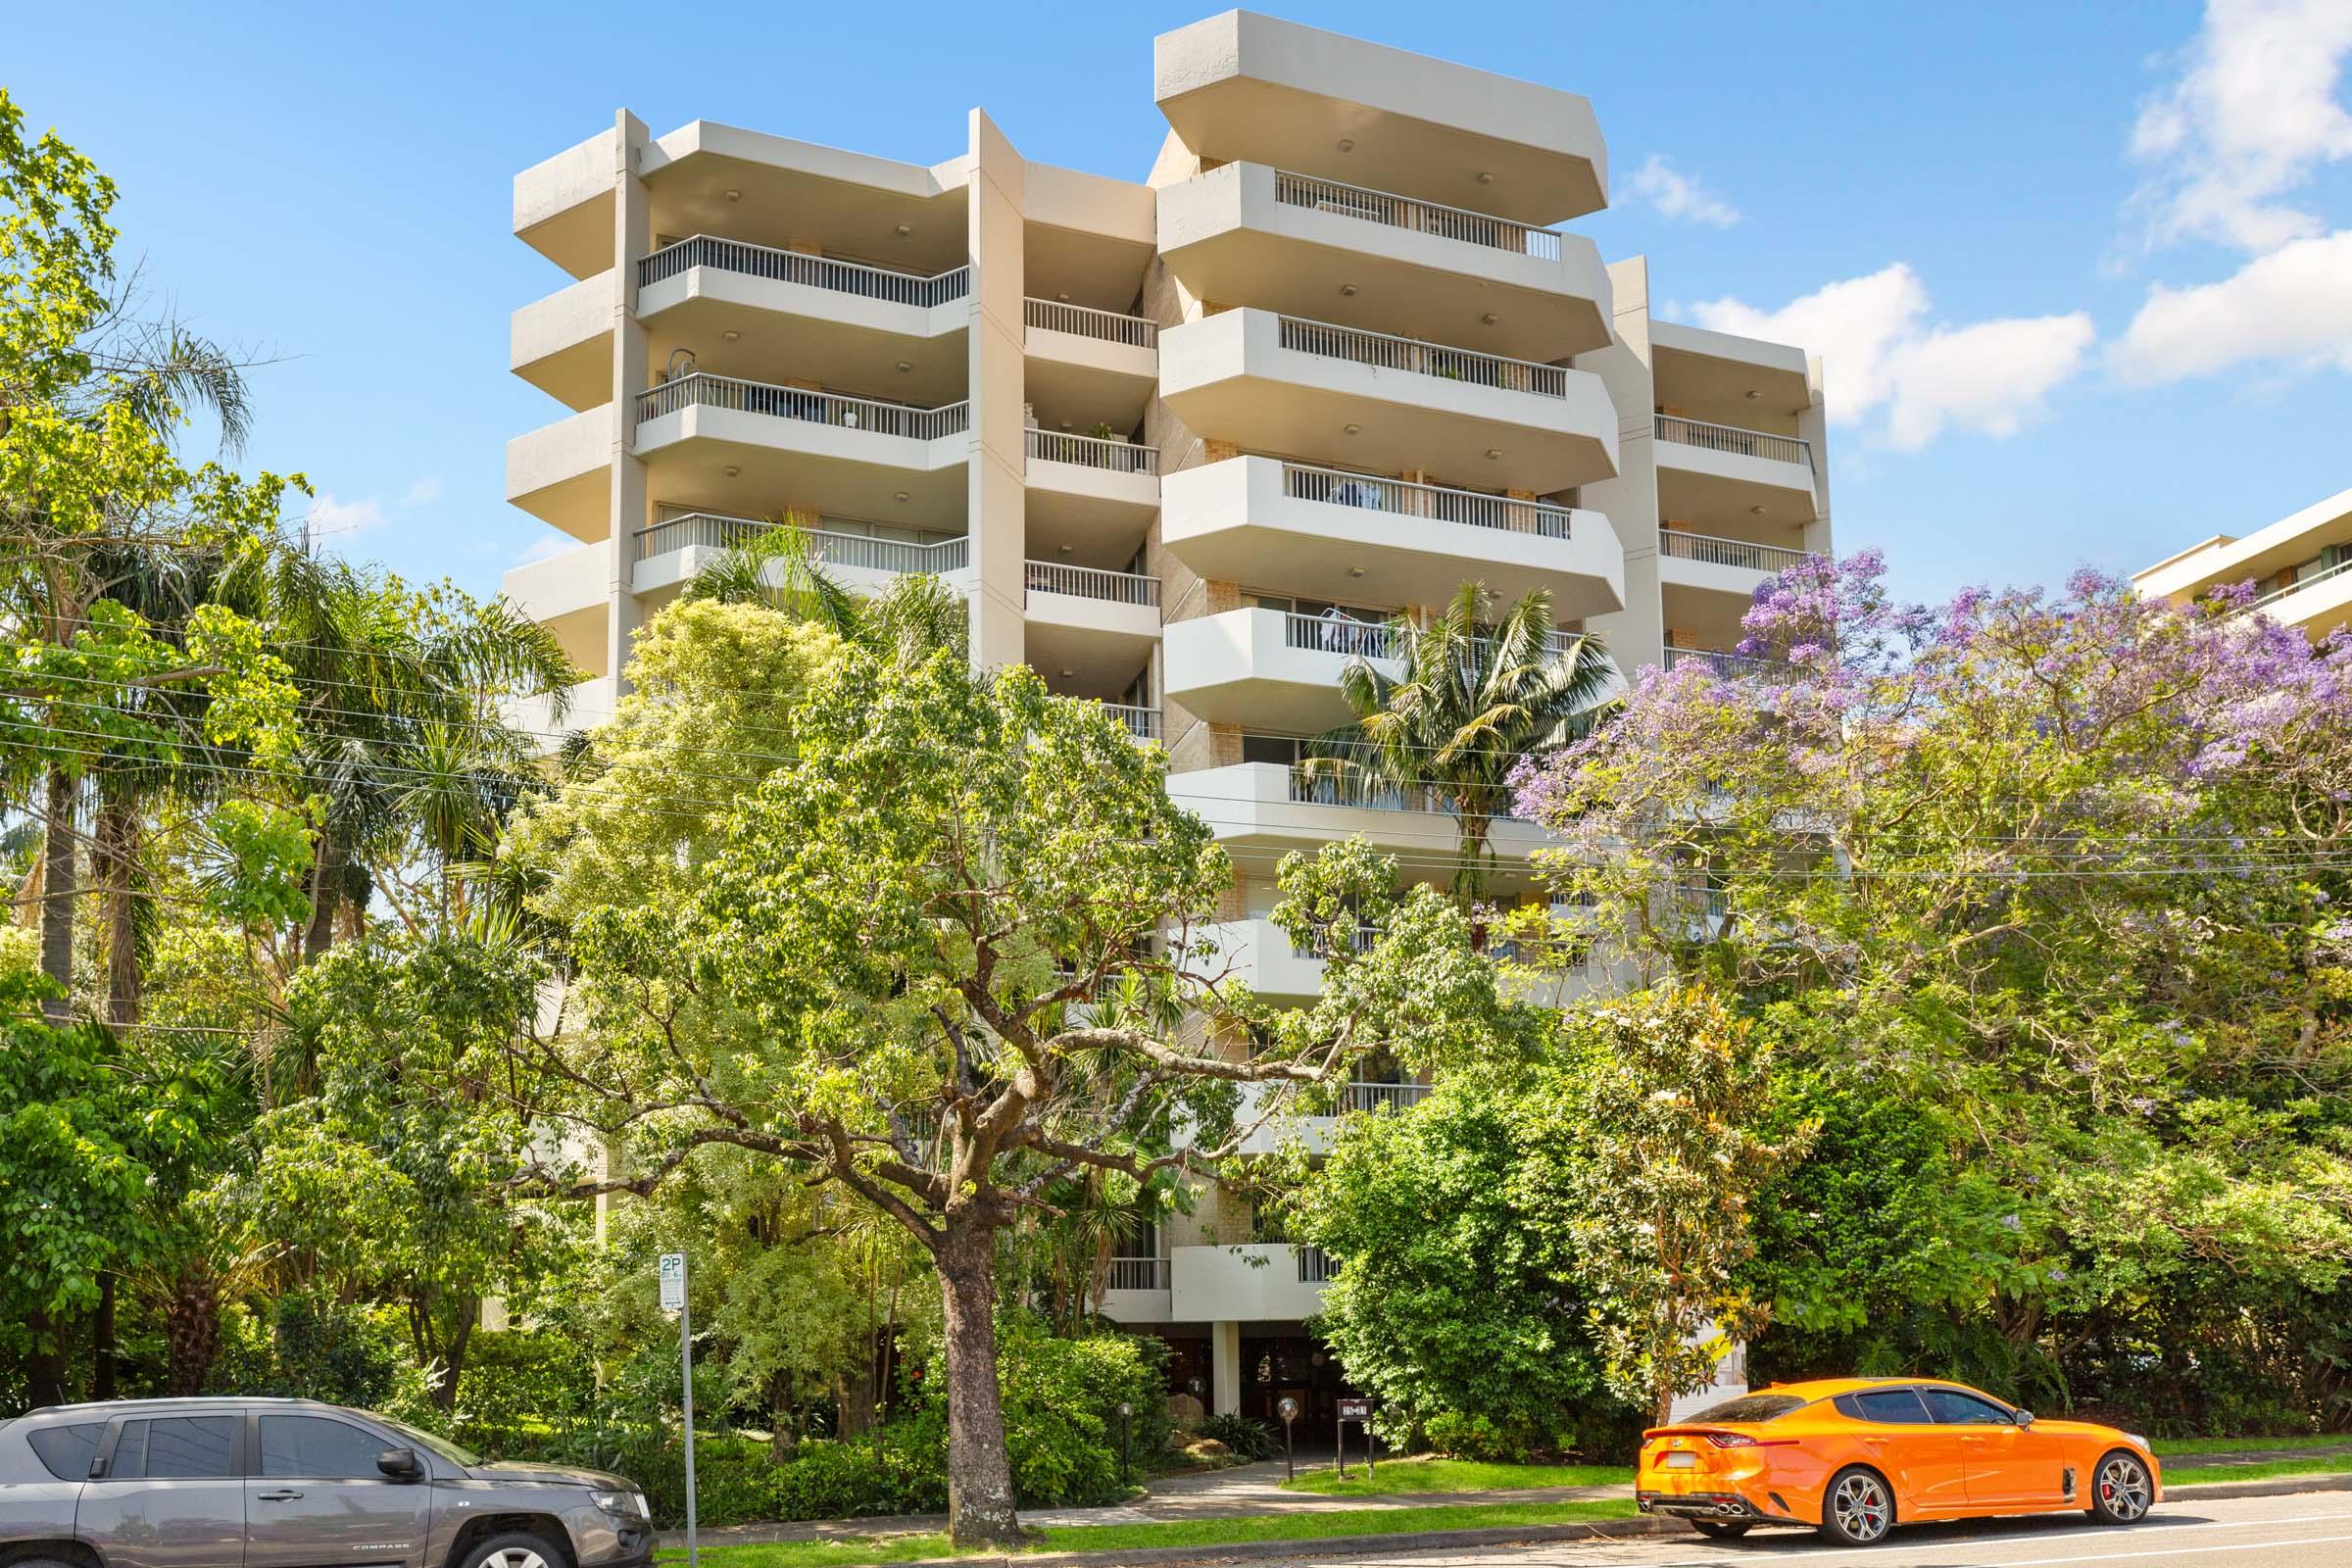 22/25-31 Johnson Street, Chatswood, NSW 2067